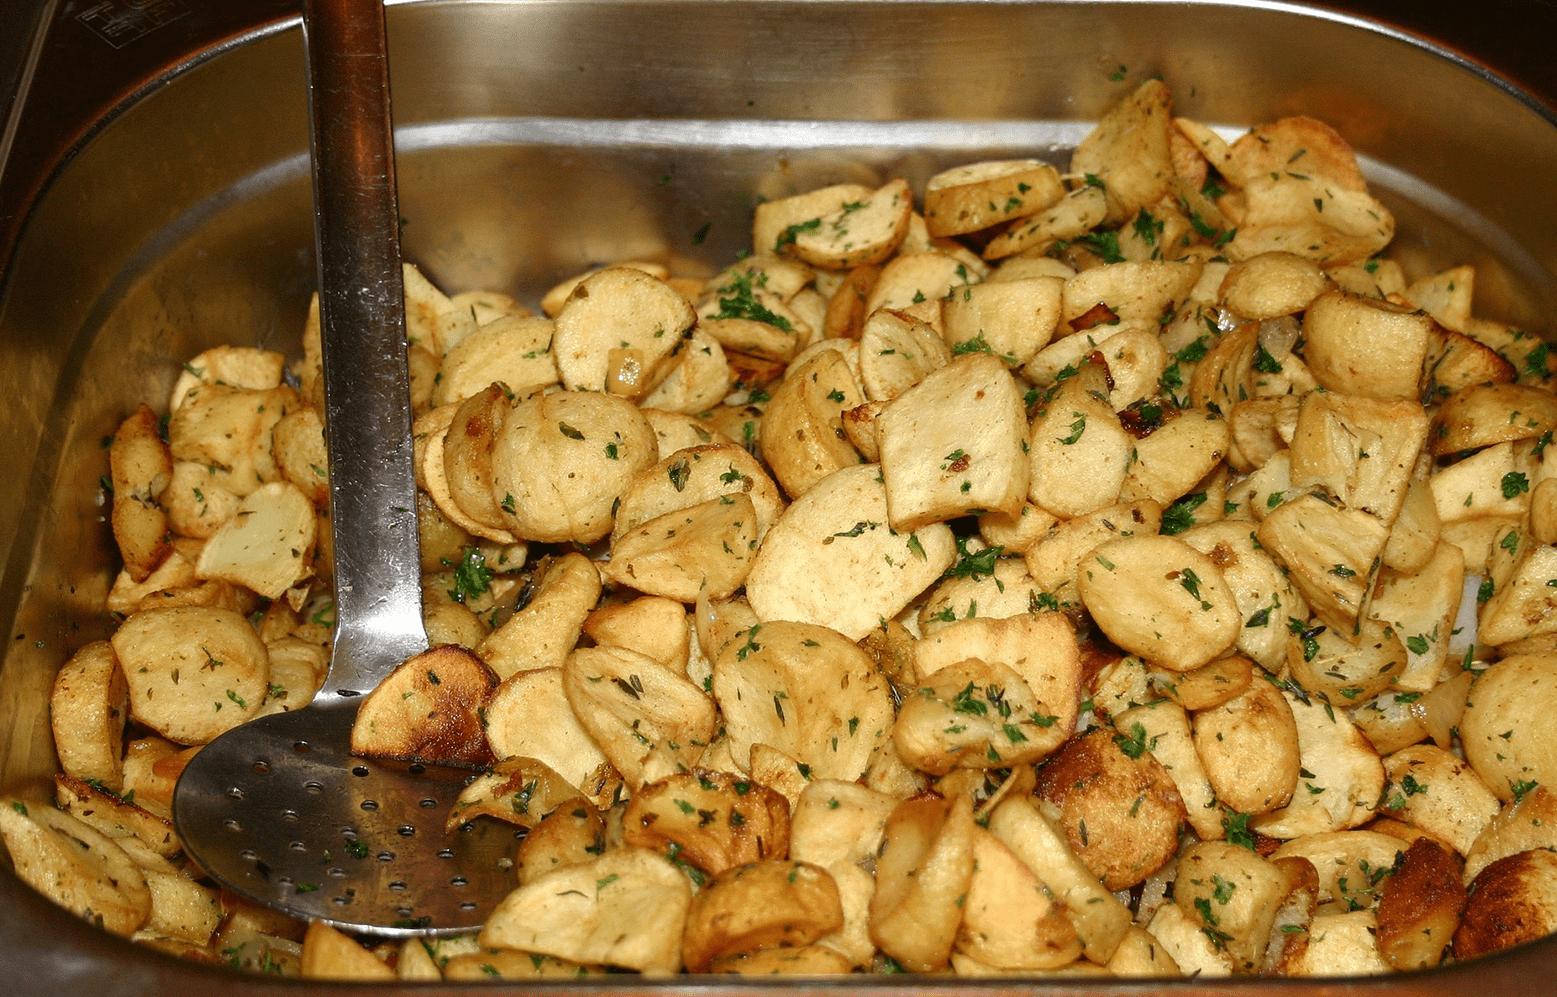 Kartoffeln im Dampfgarer